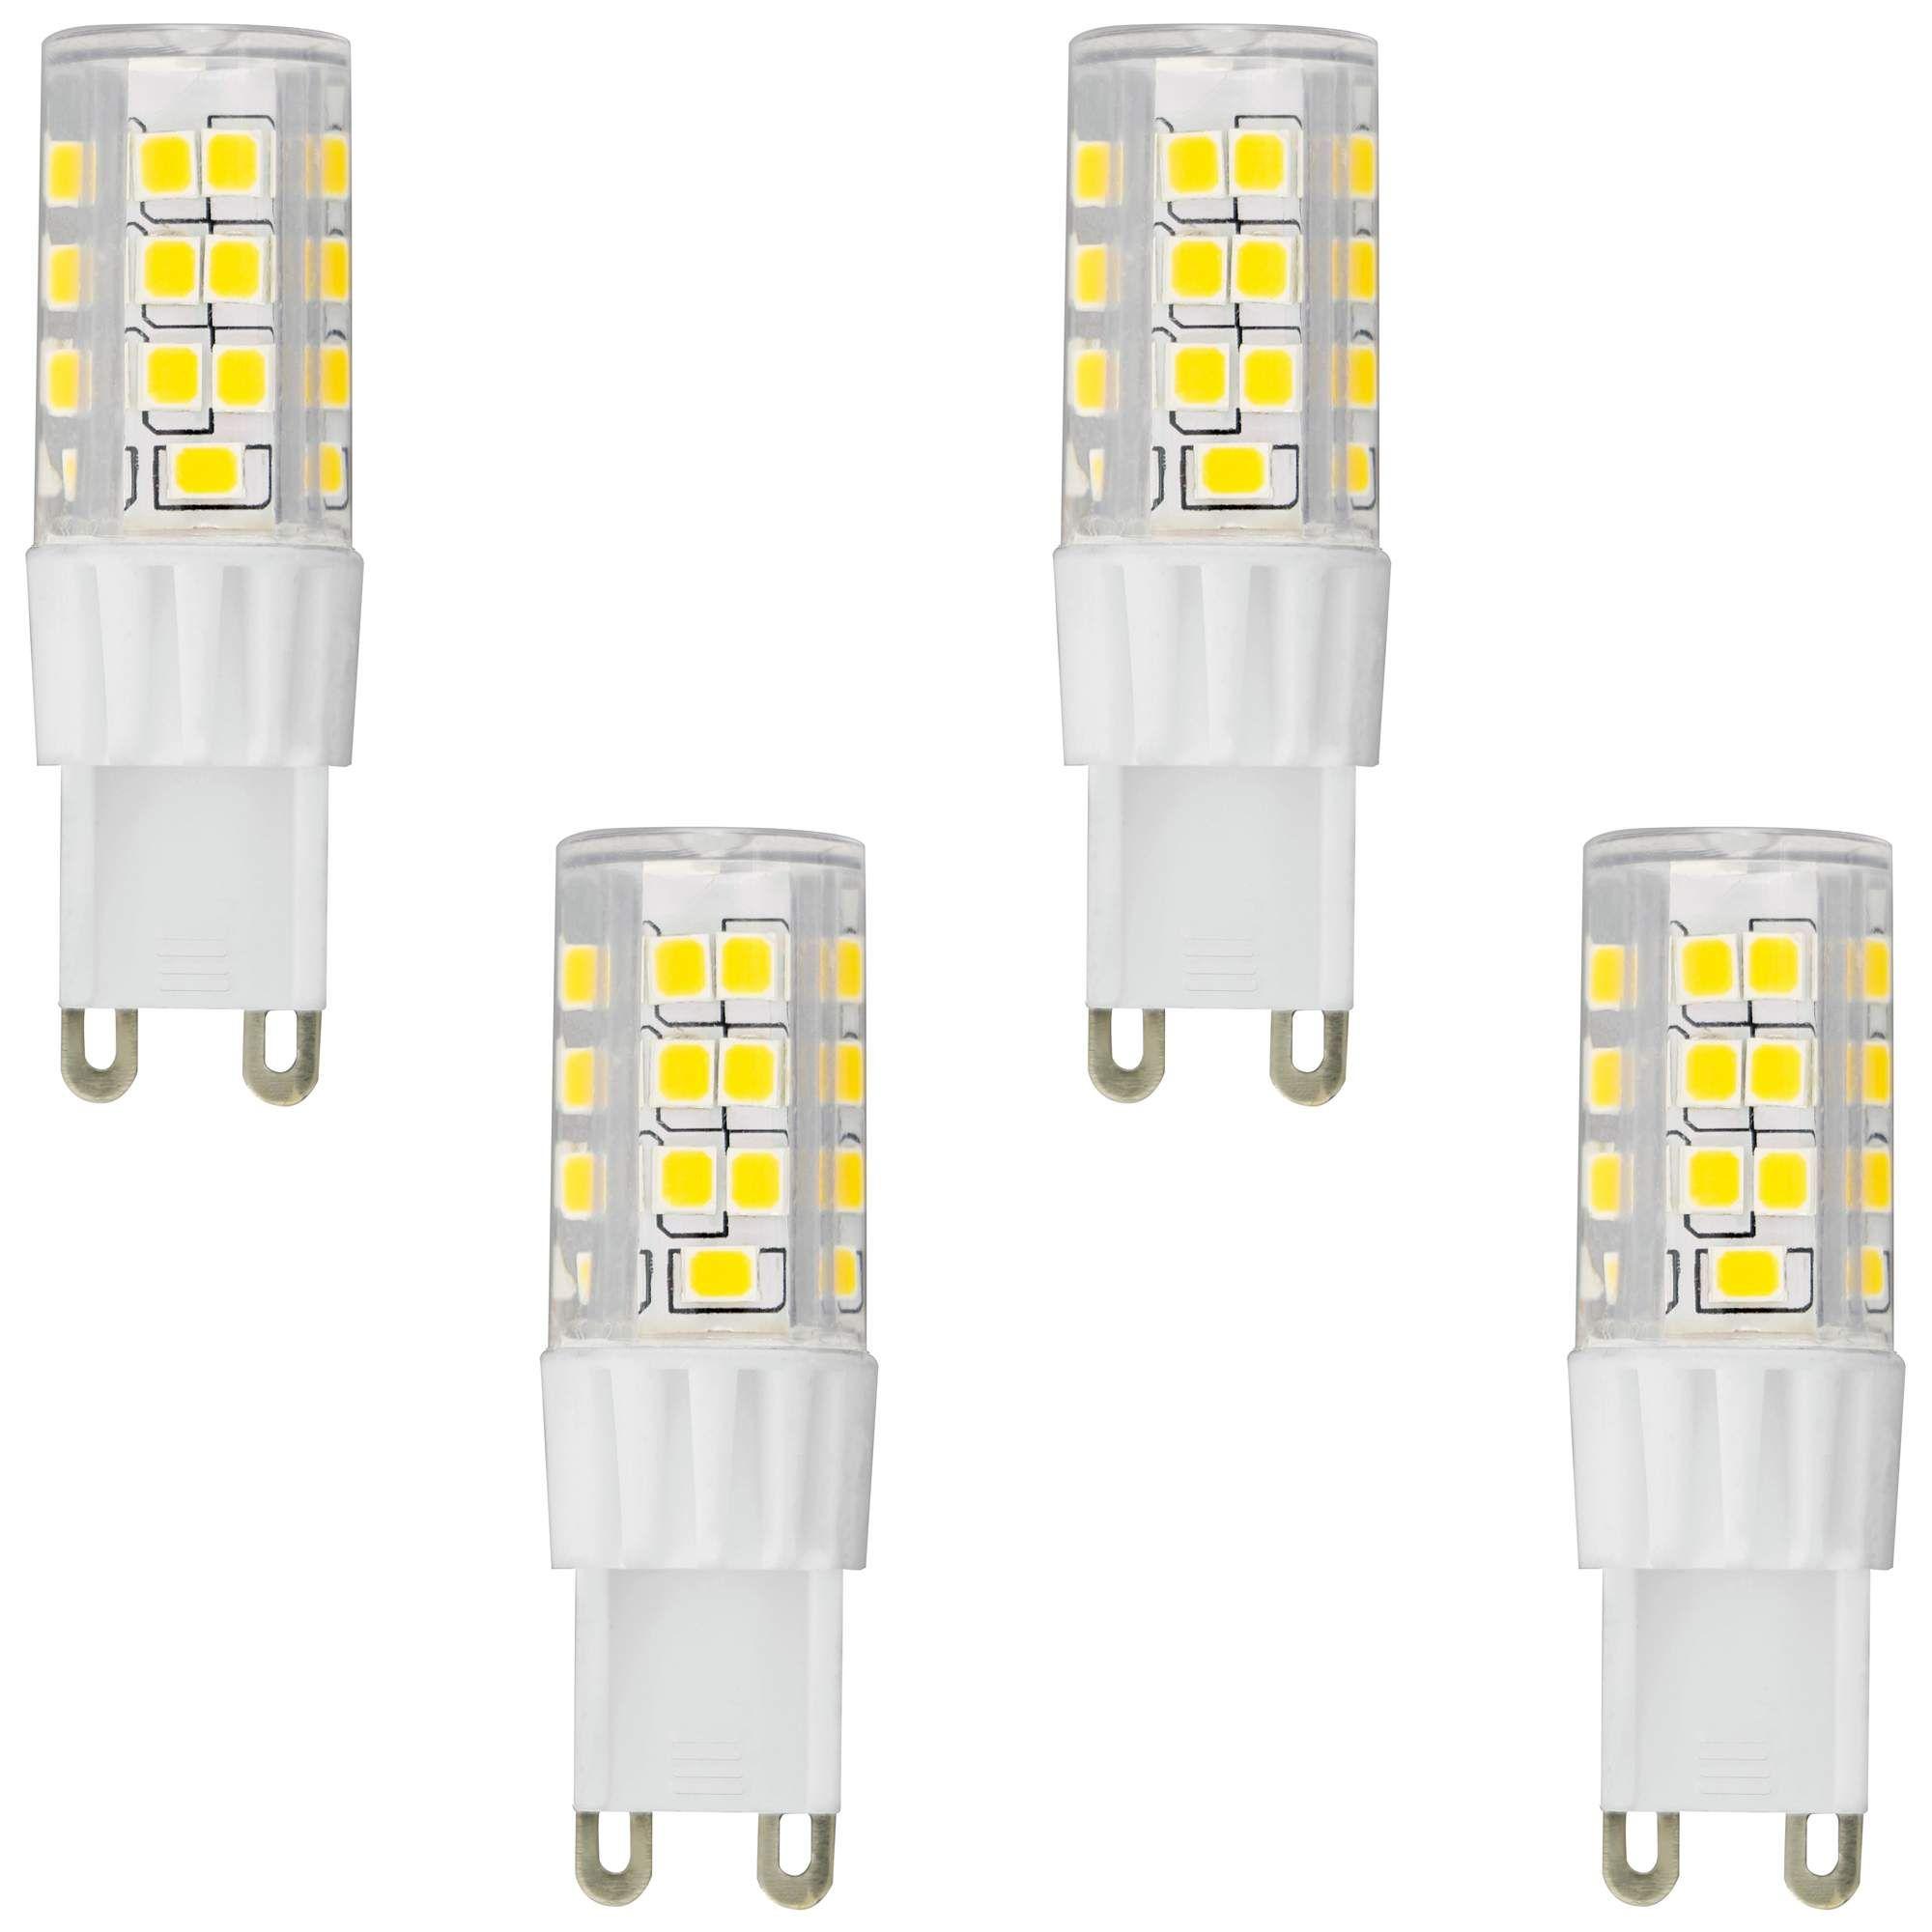 Light Bulbs 50w Equivalent Tesler 5w Led Dimmable G9 Base Bulb 4 Pack Energy Efficient Bulbs Bulb Led Light Bulb